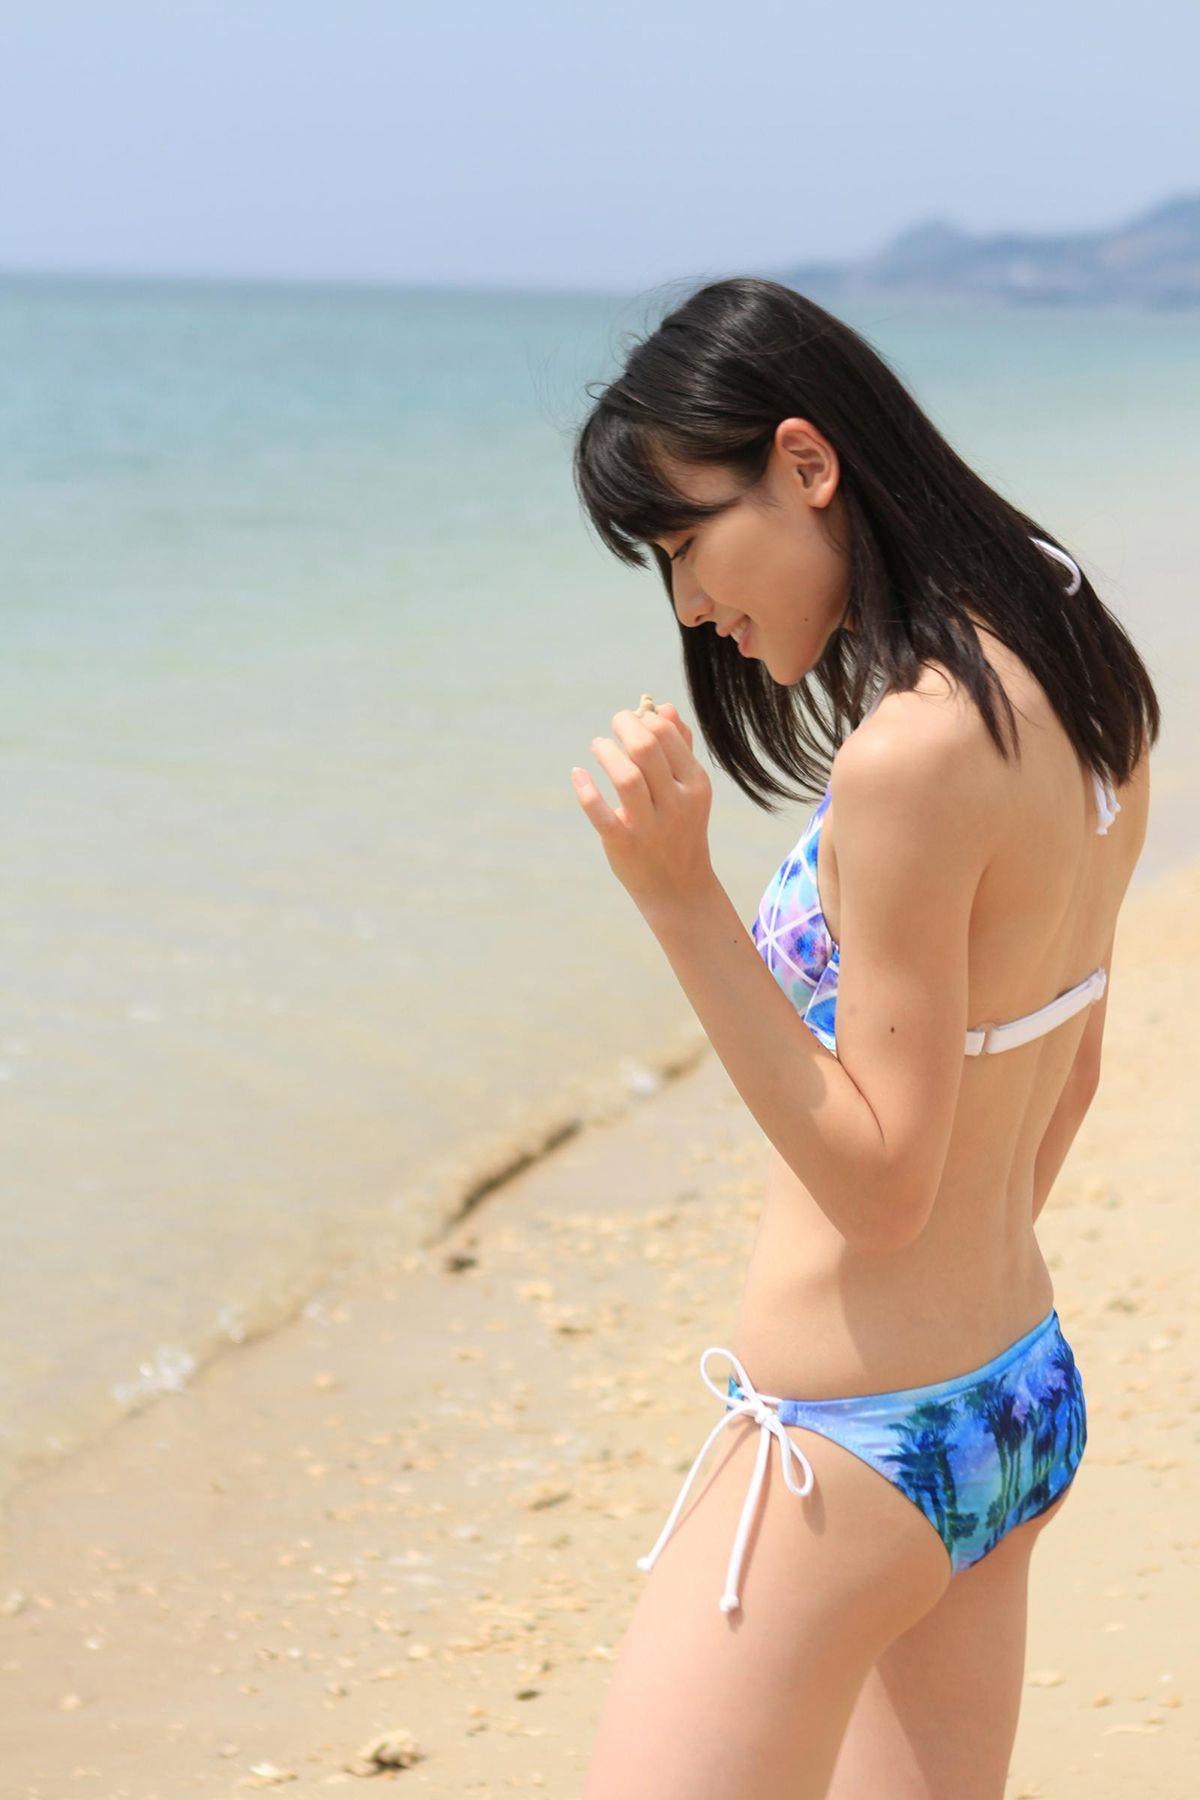 矢島舞美 エロ画像 11